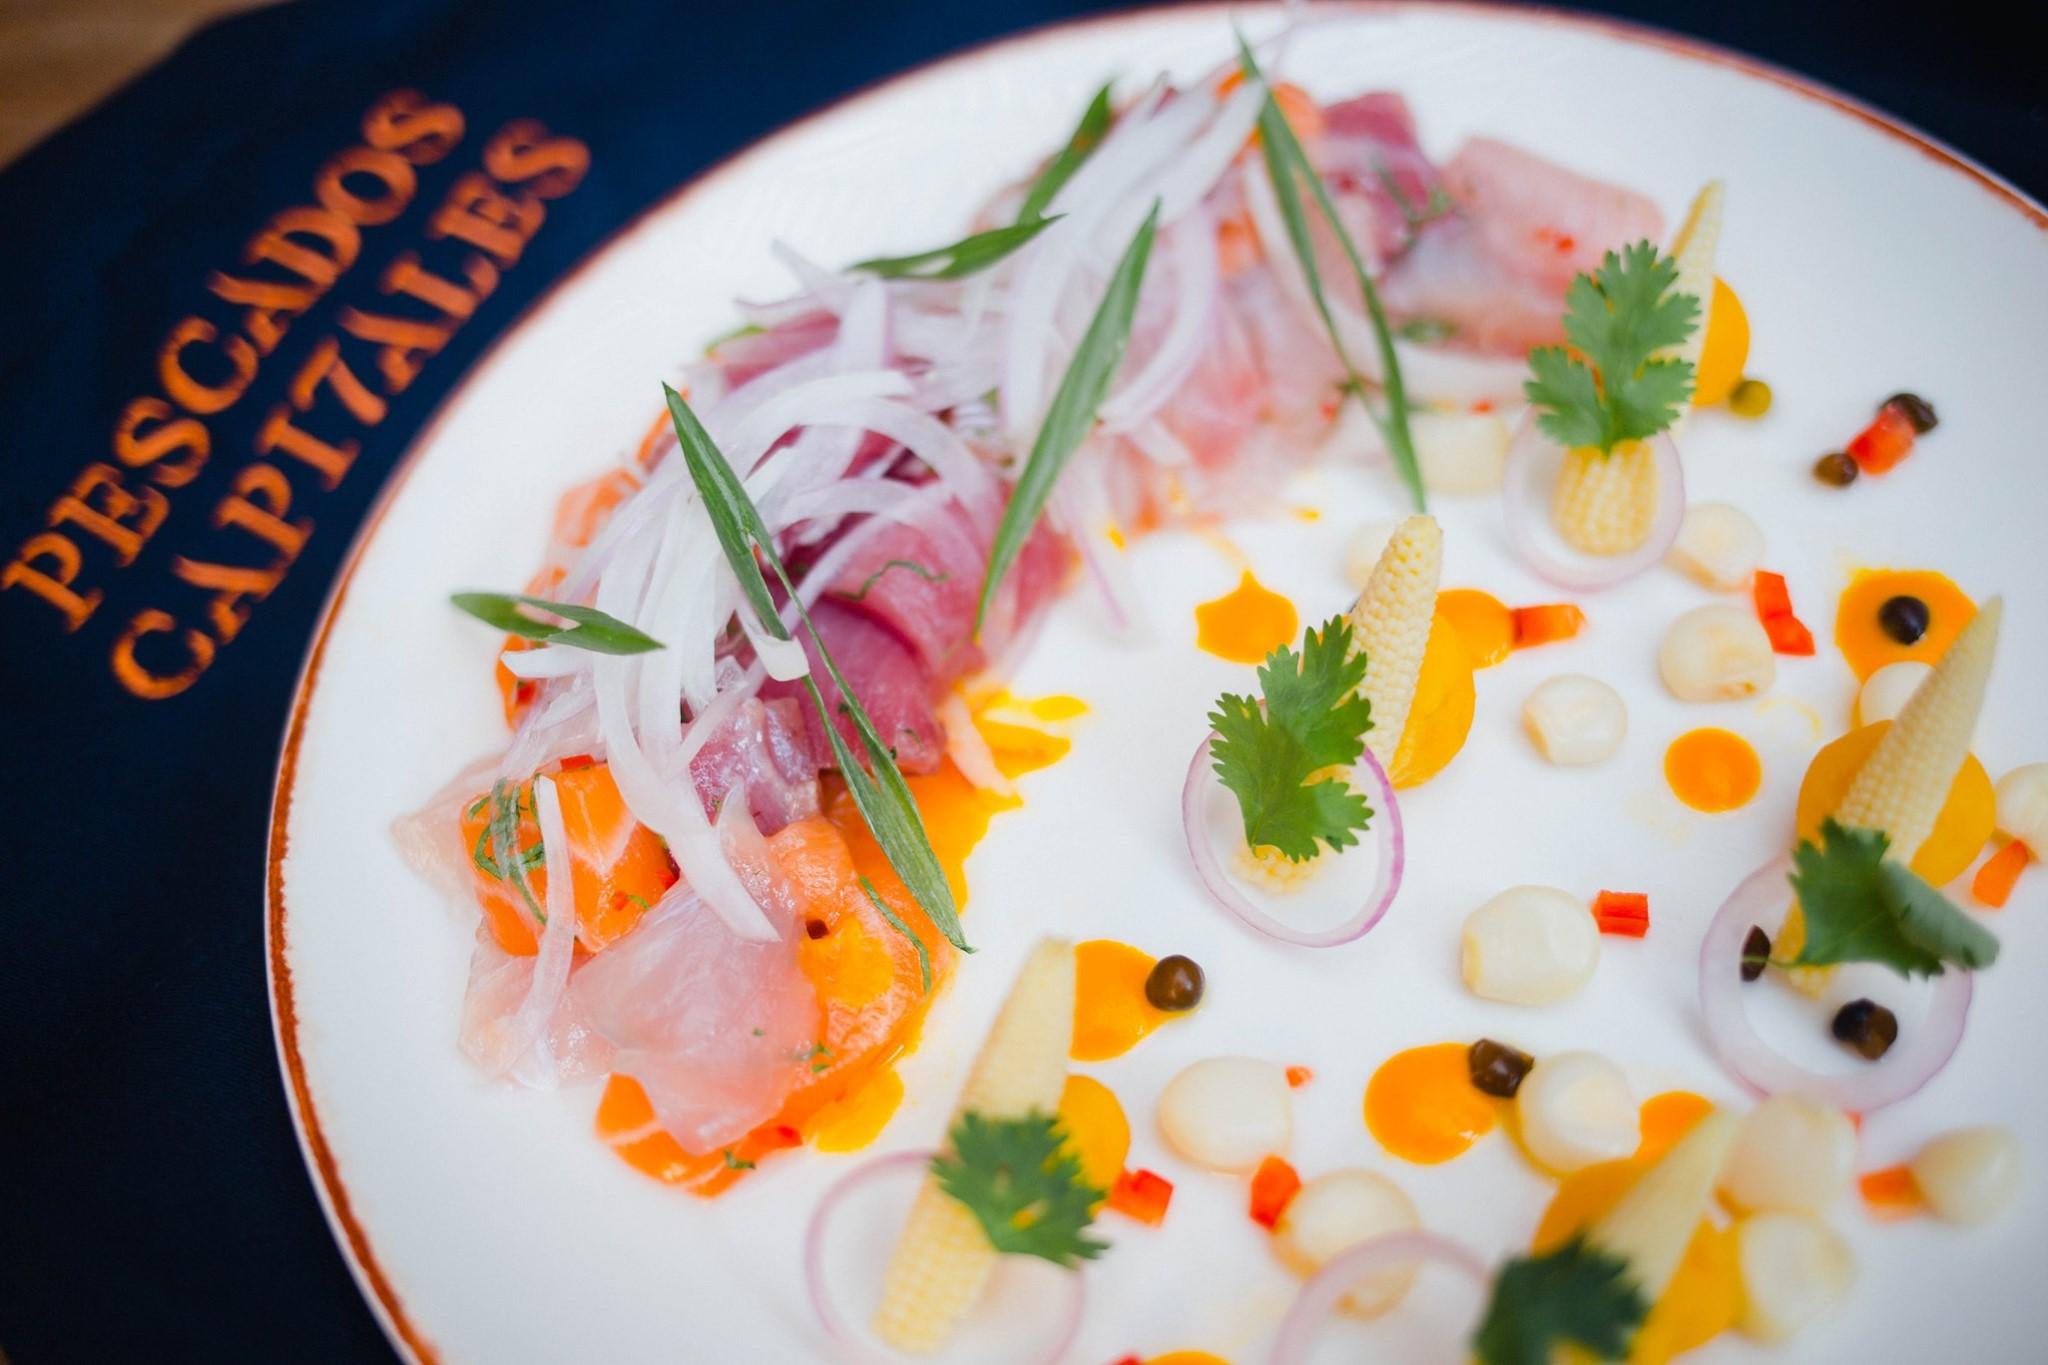 pescados capitales restaurante